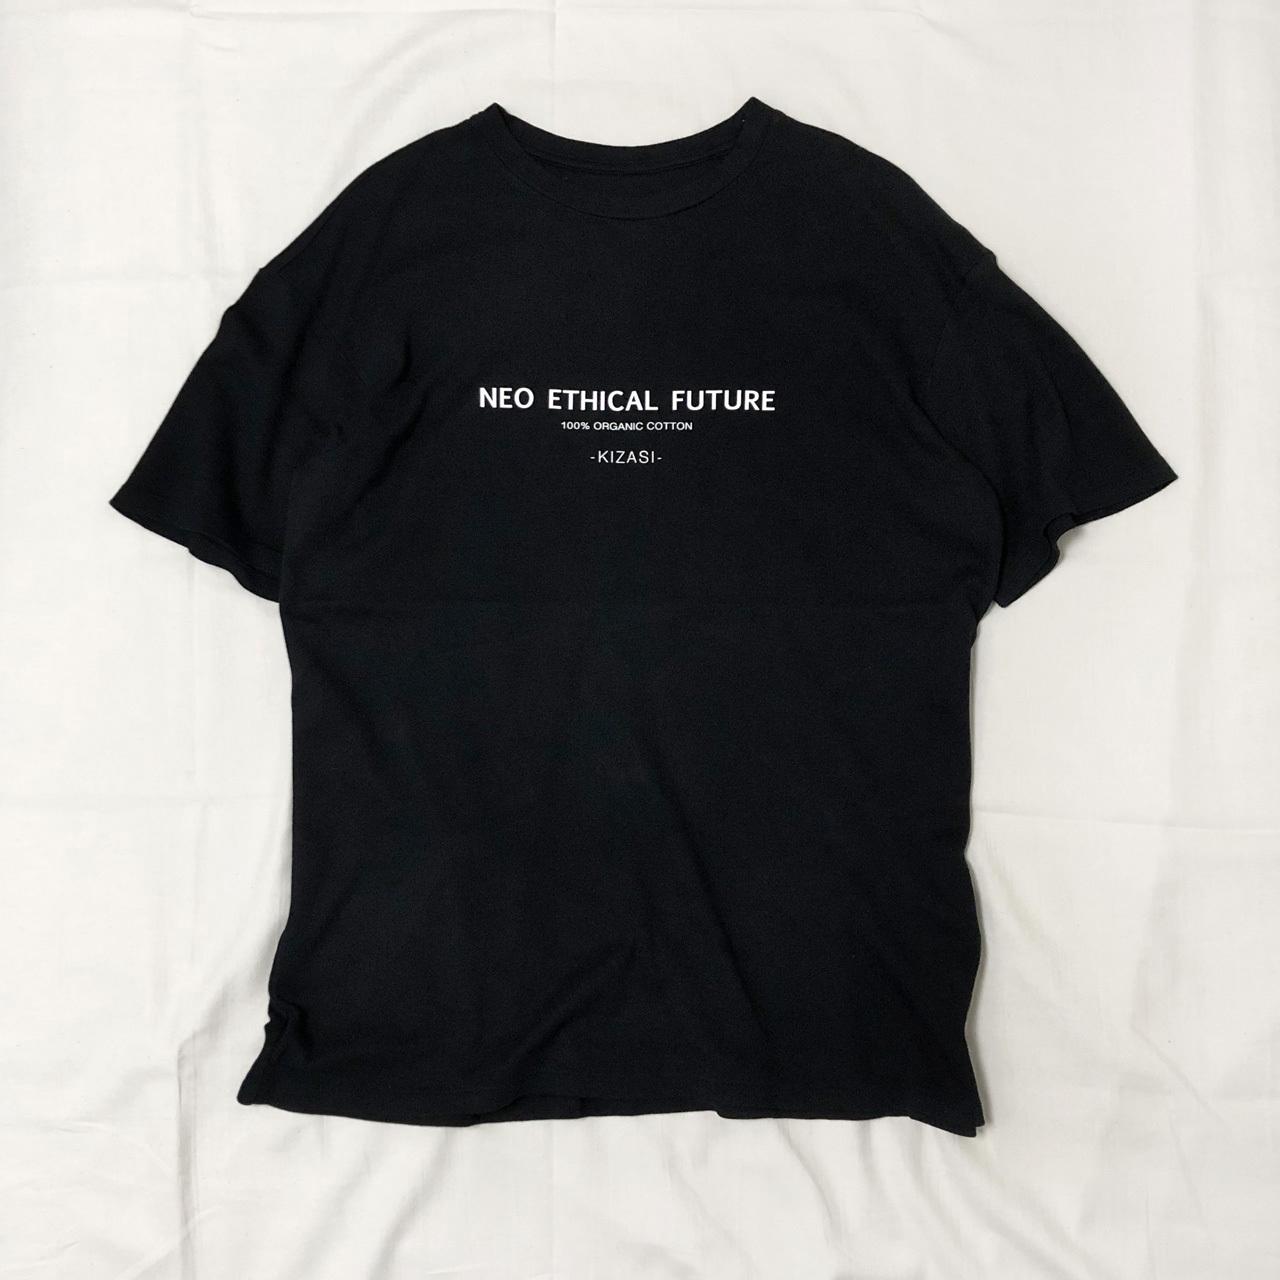 """NEO ETHICAL FUTURE"" ORGANIC COTTON BIG T-SHIRT 【受注生産】"